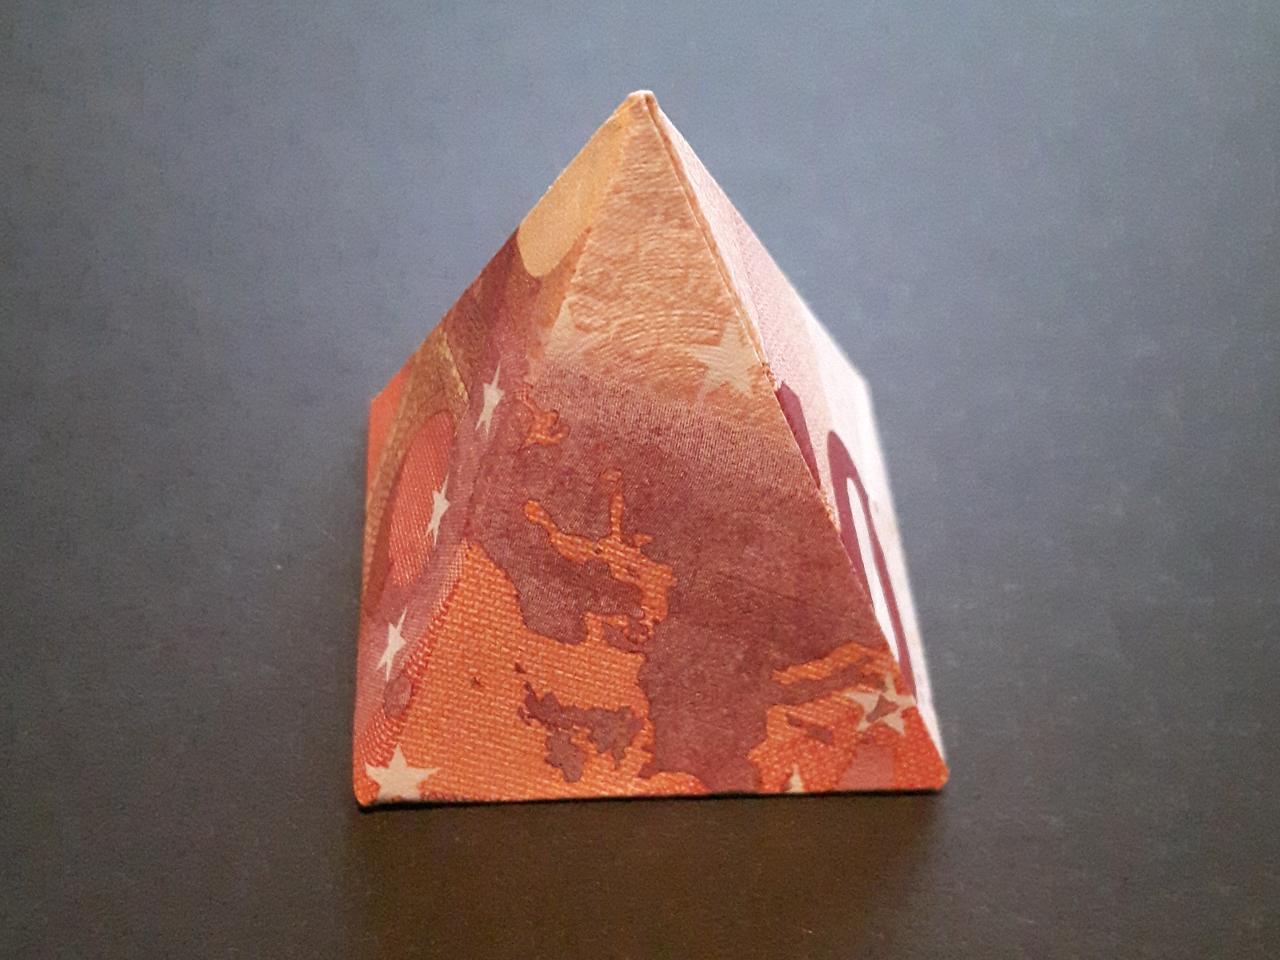 Piramida pliată dintr-o verificare 10 €